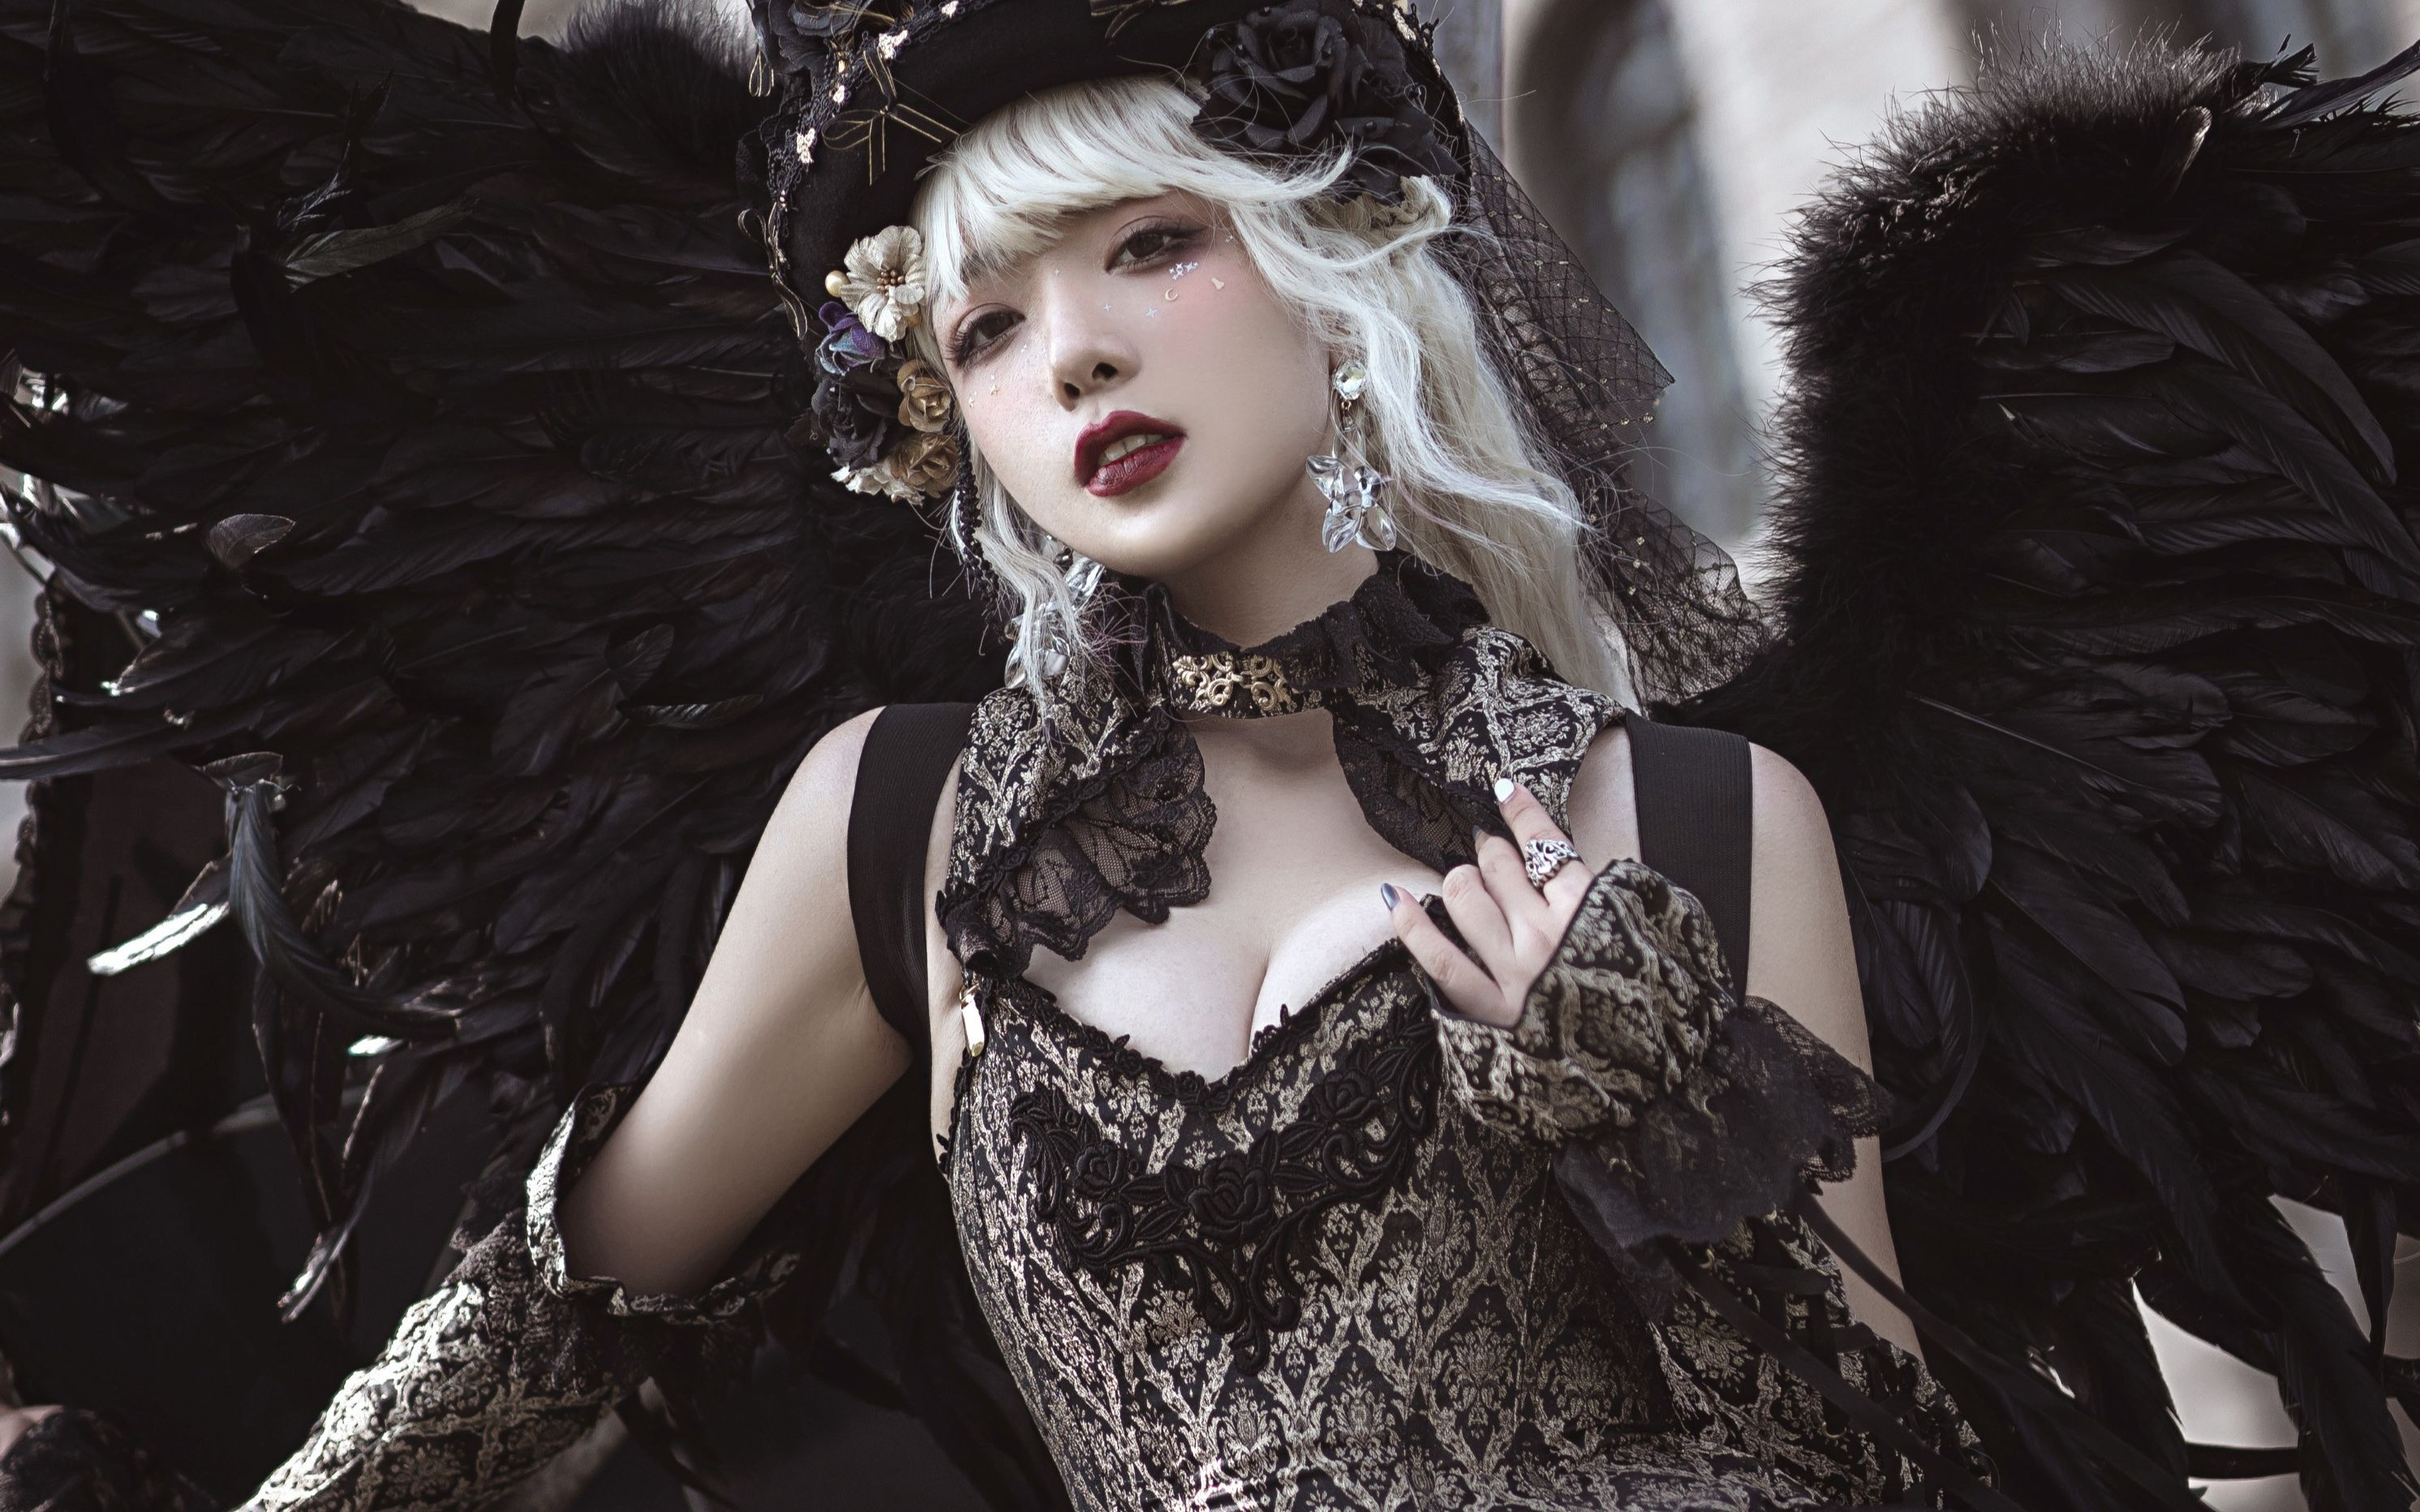 【Lolita】lo娘的华丽与性感!!(一见倾心系列)